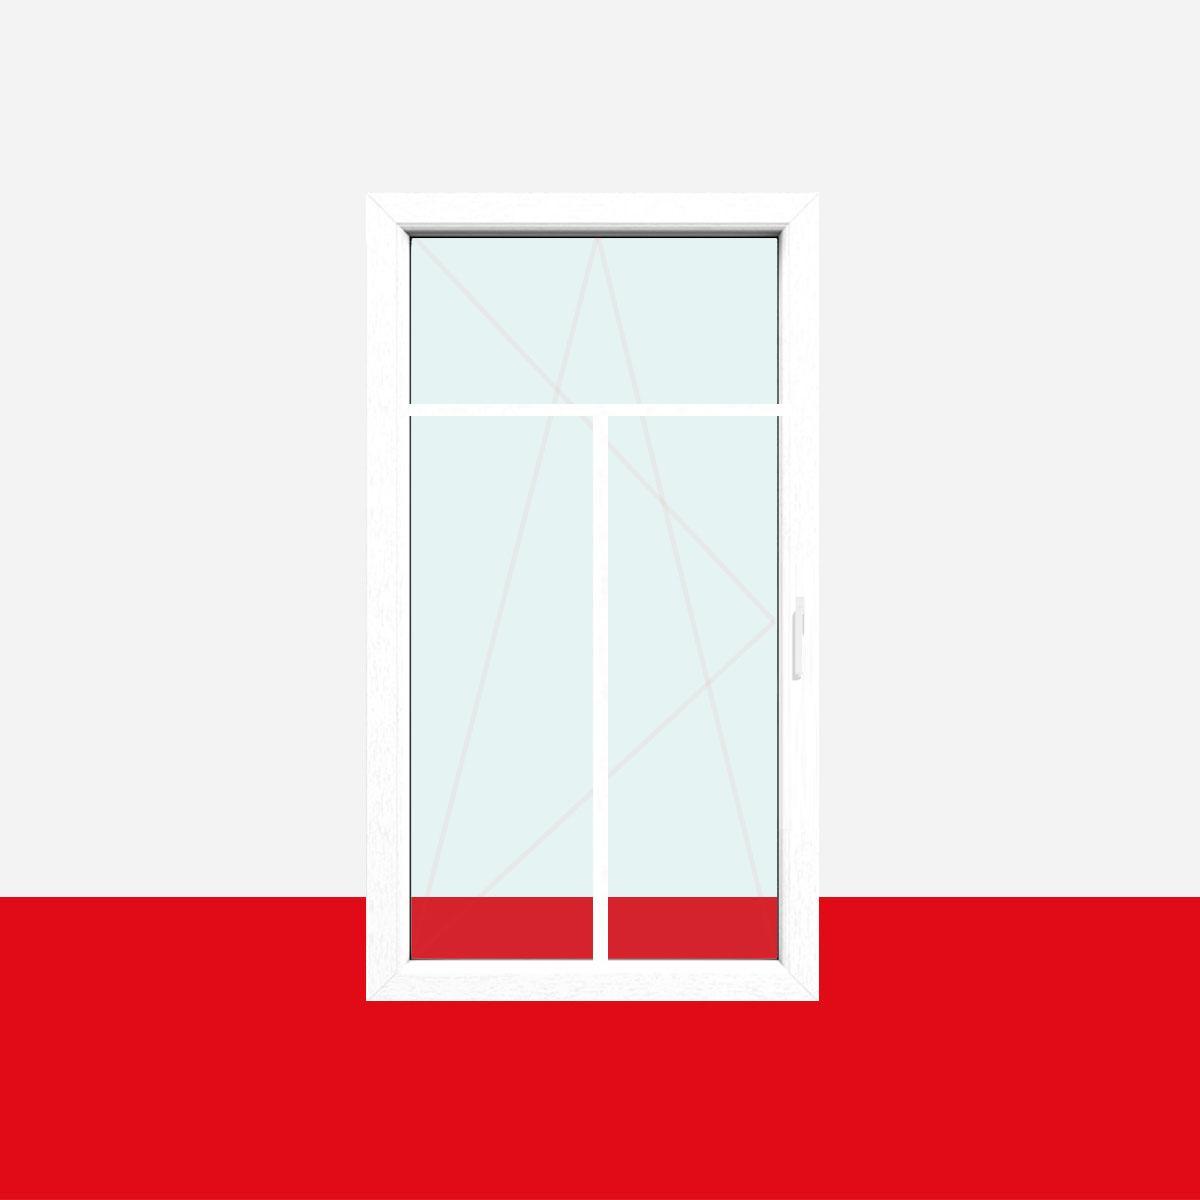 BxH:1200x1300 Glas:3-Fach Drutex Kunststofffenster wei/ß Dreh Kipp Anschlag:DIN Rechts